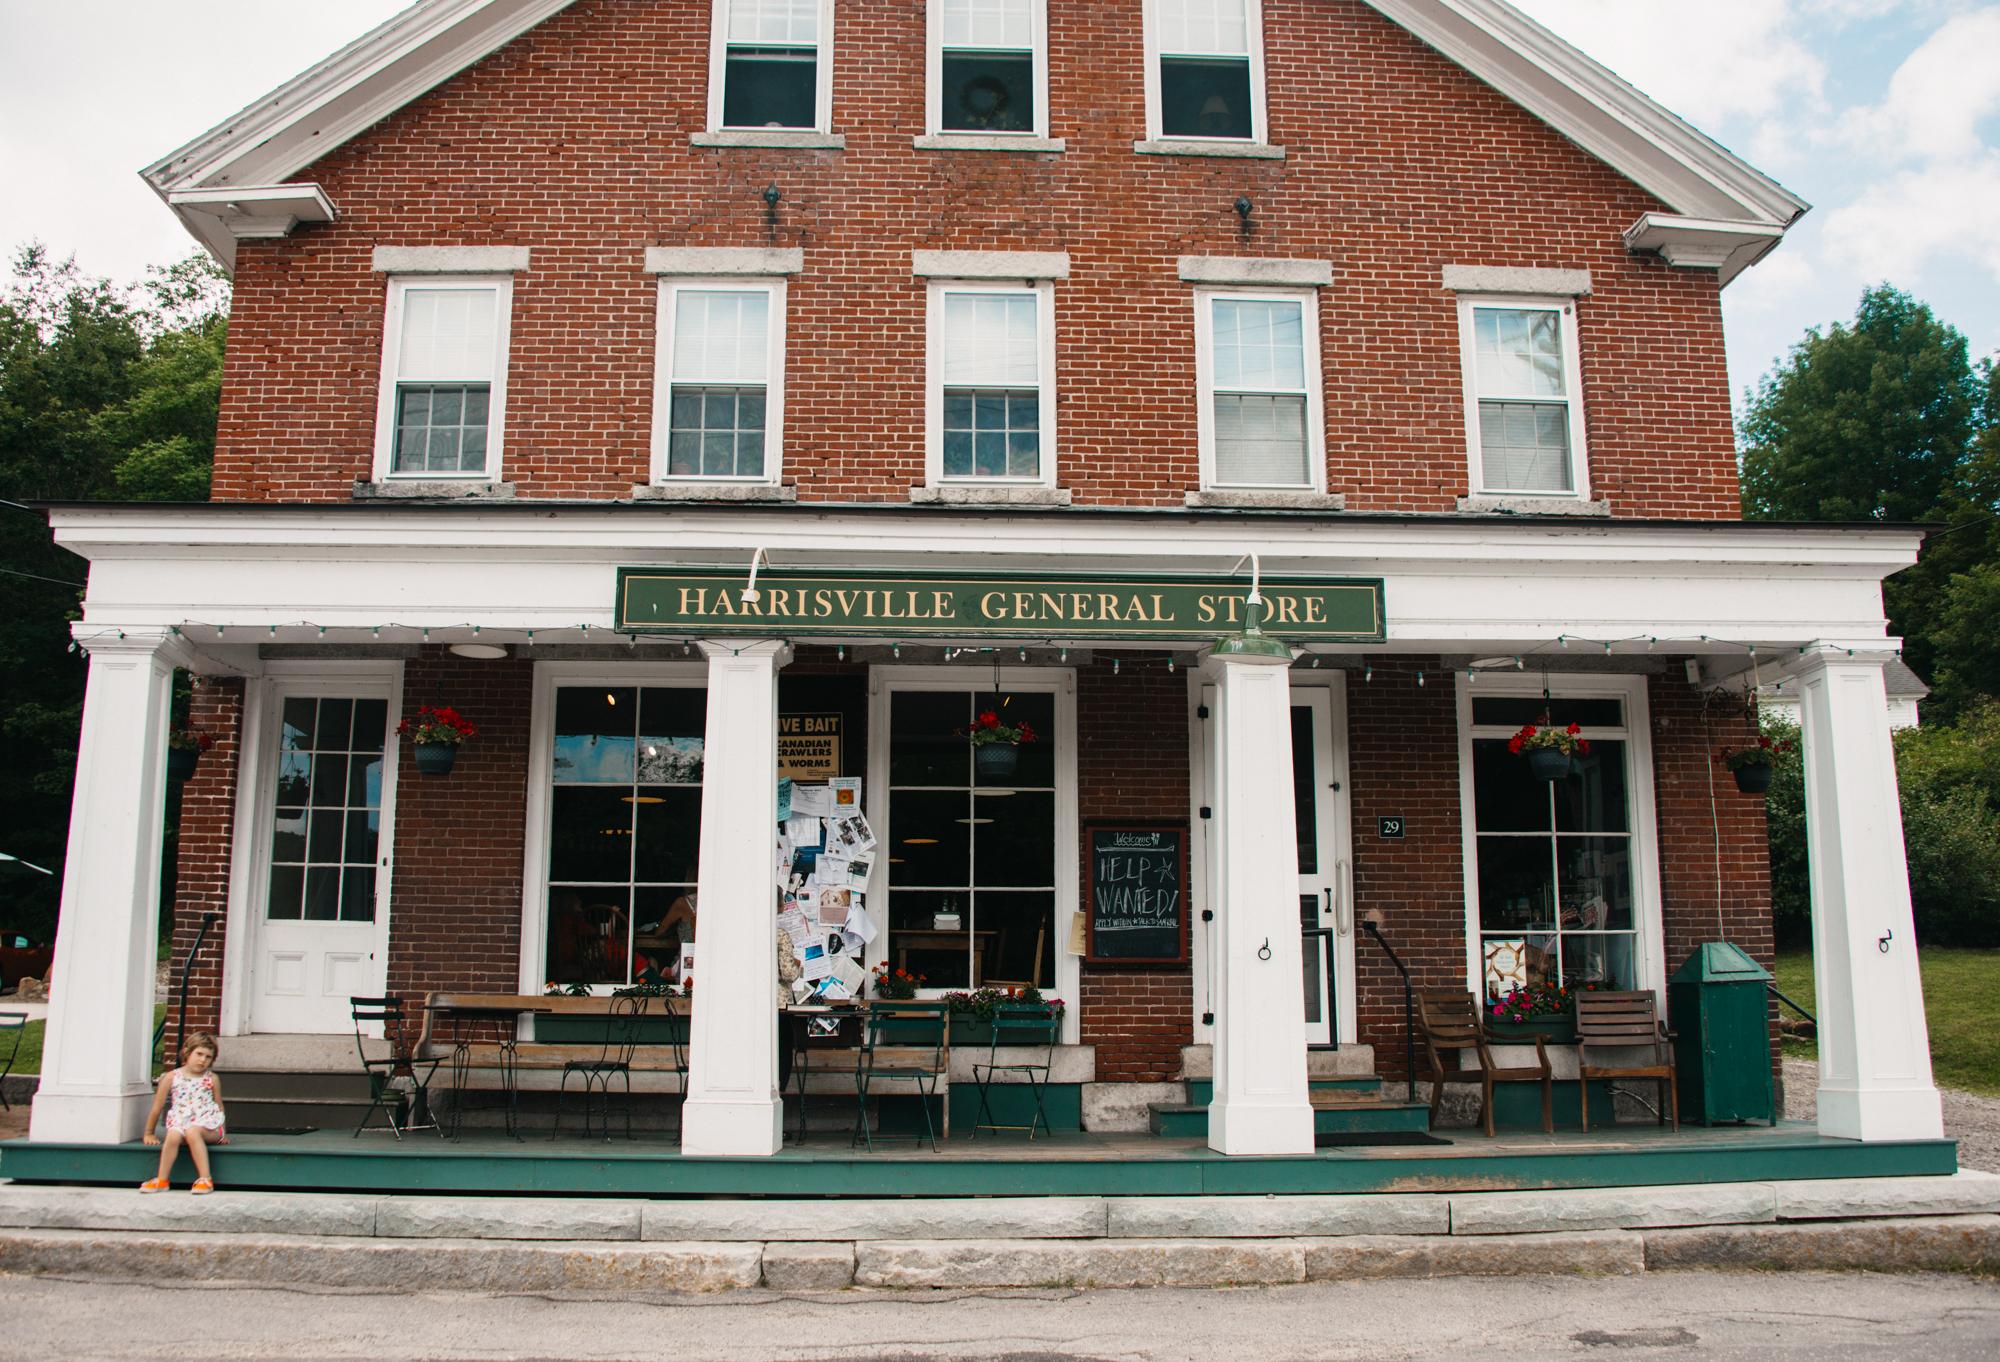 Harrisville General Store in Harrisville, New Hampshire